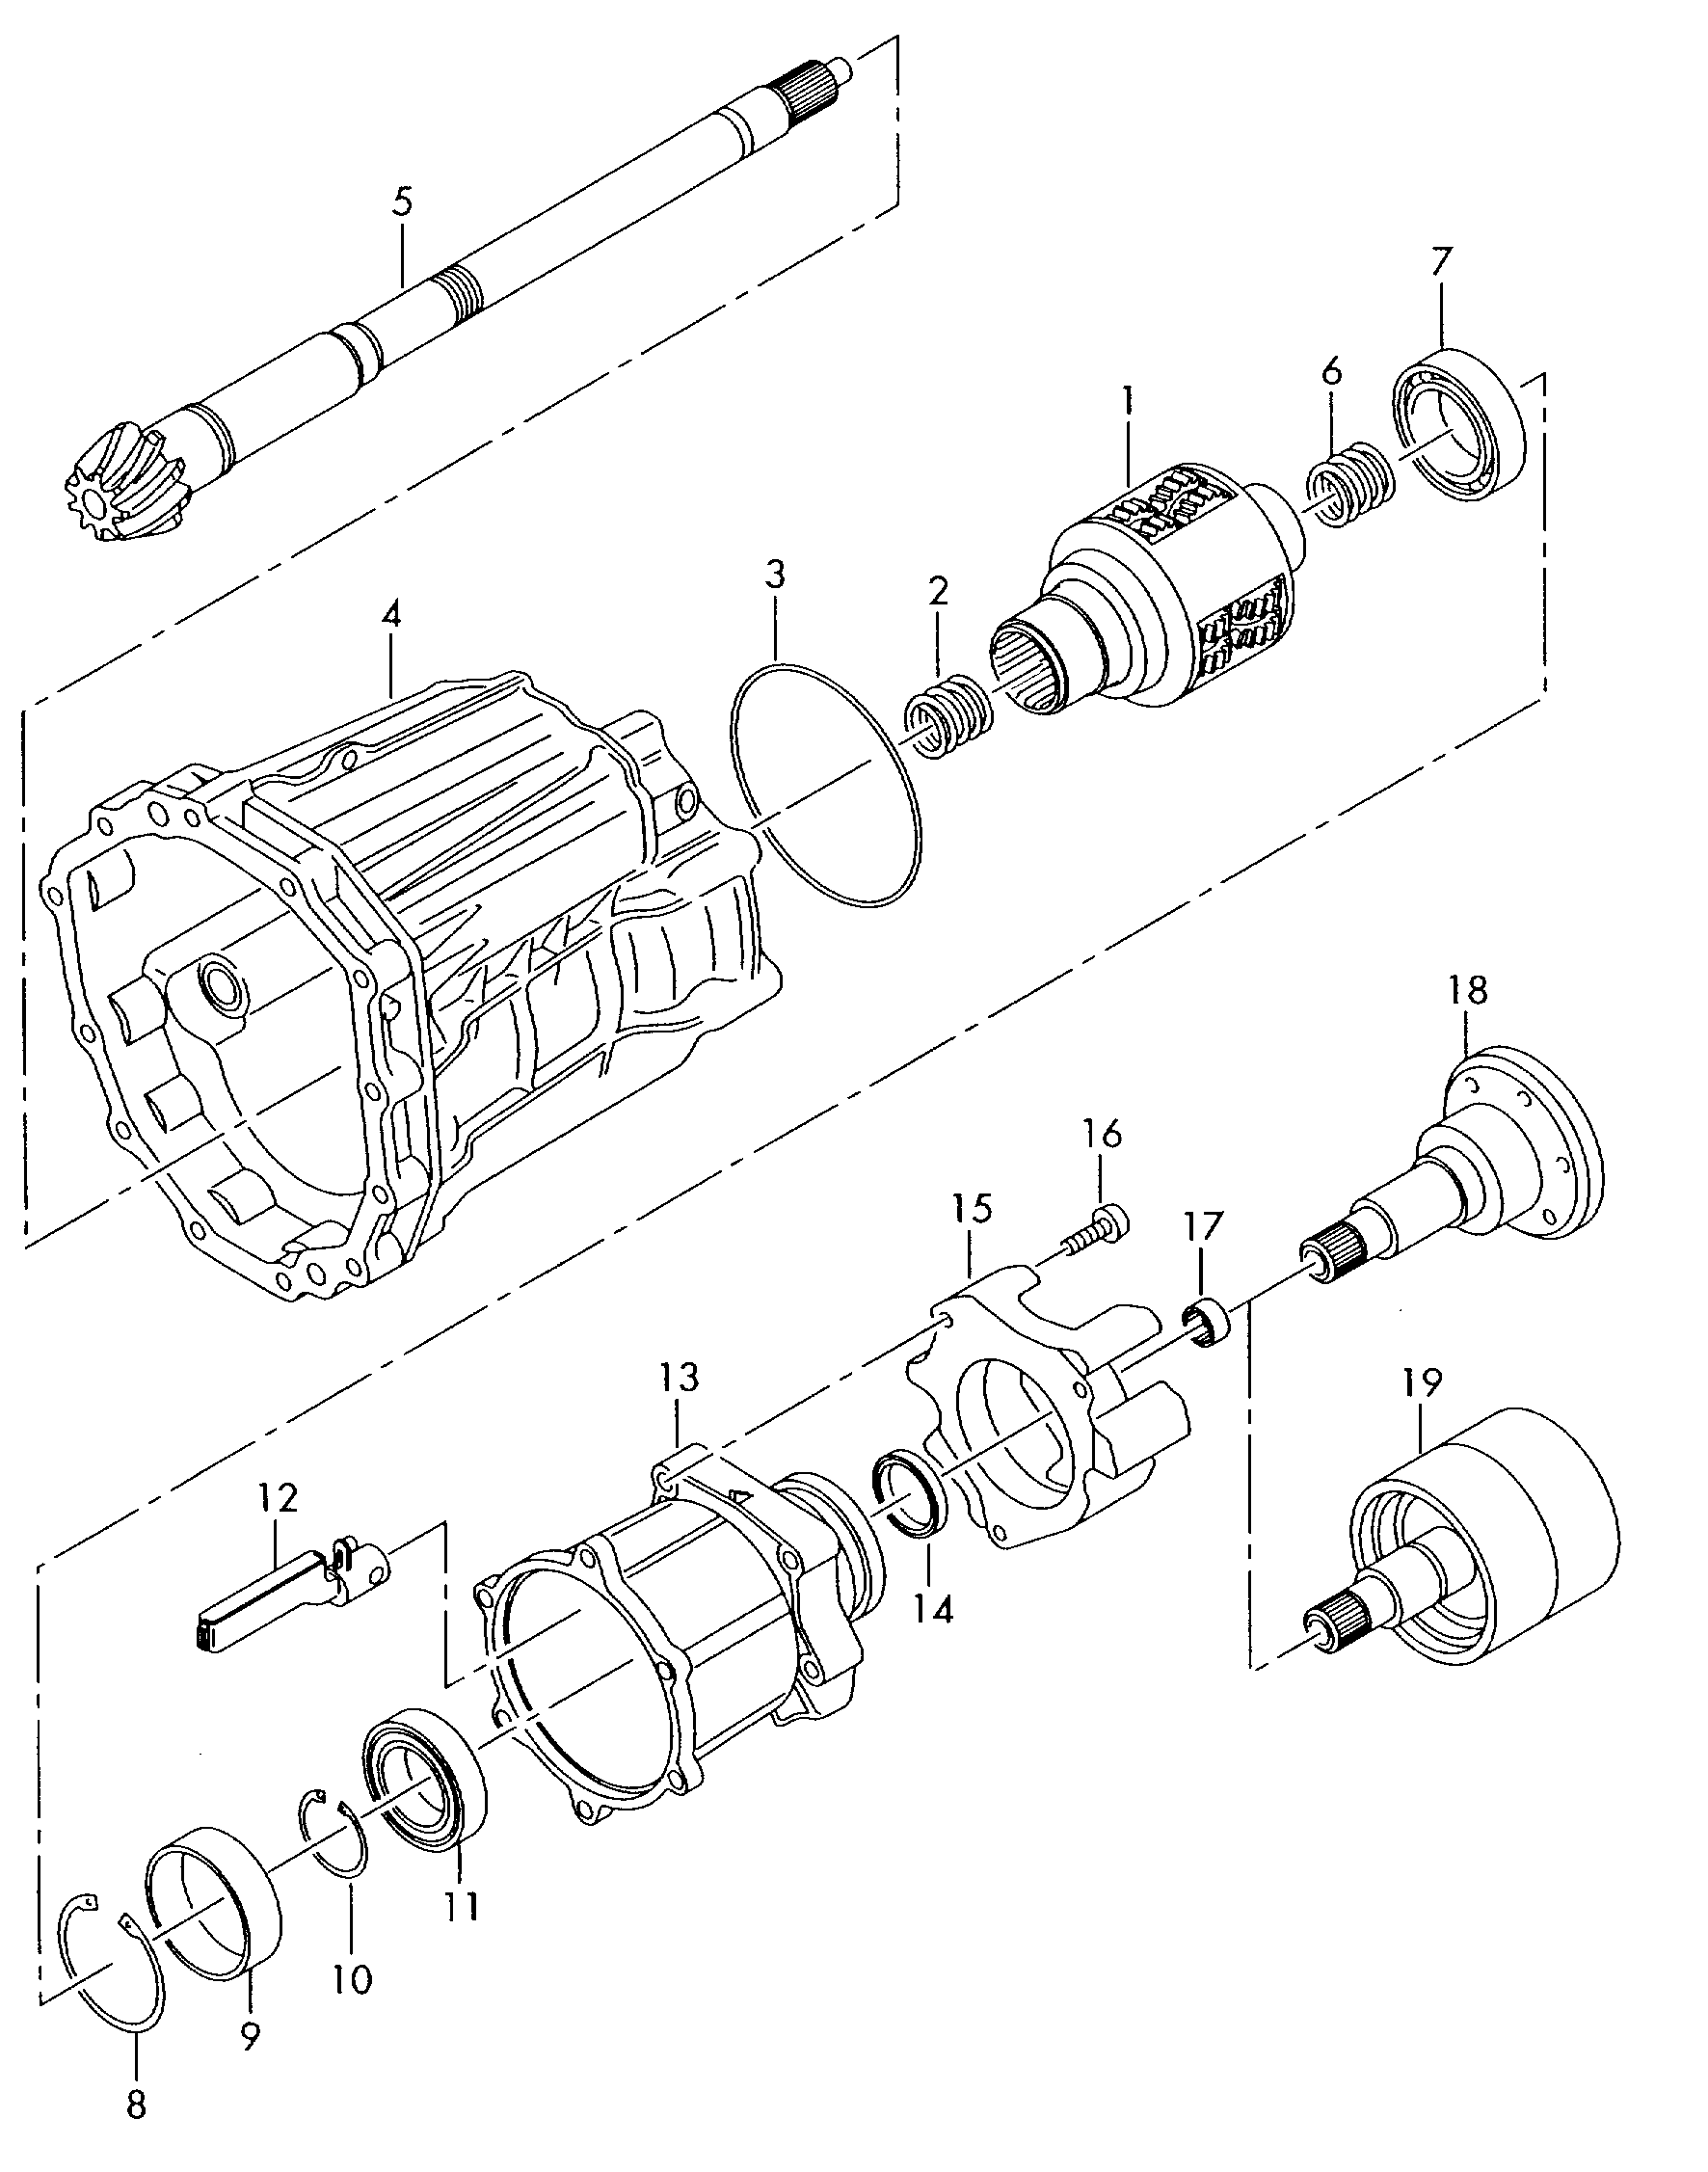 Audi A4 Avant 2005 2008 Centre Differential Self Locking Engine Schematics Vag Etka